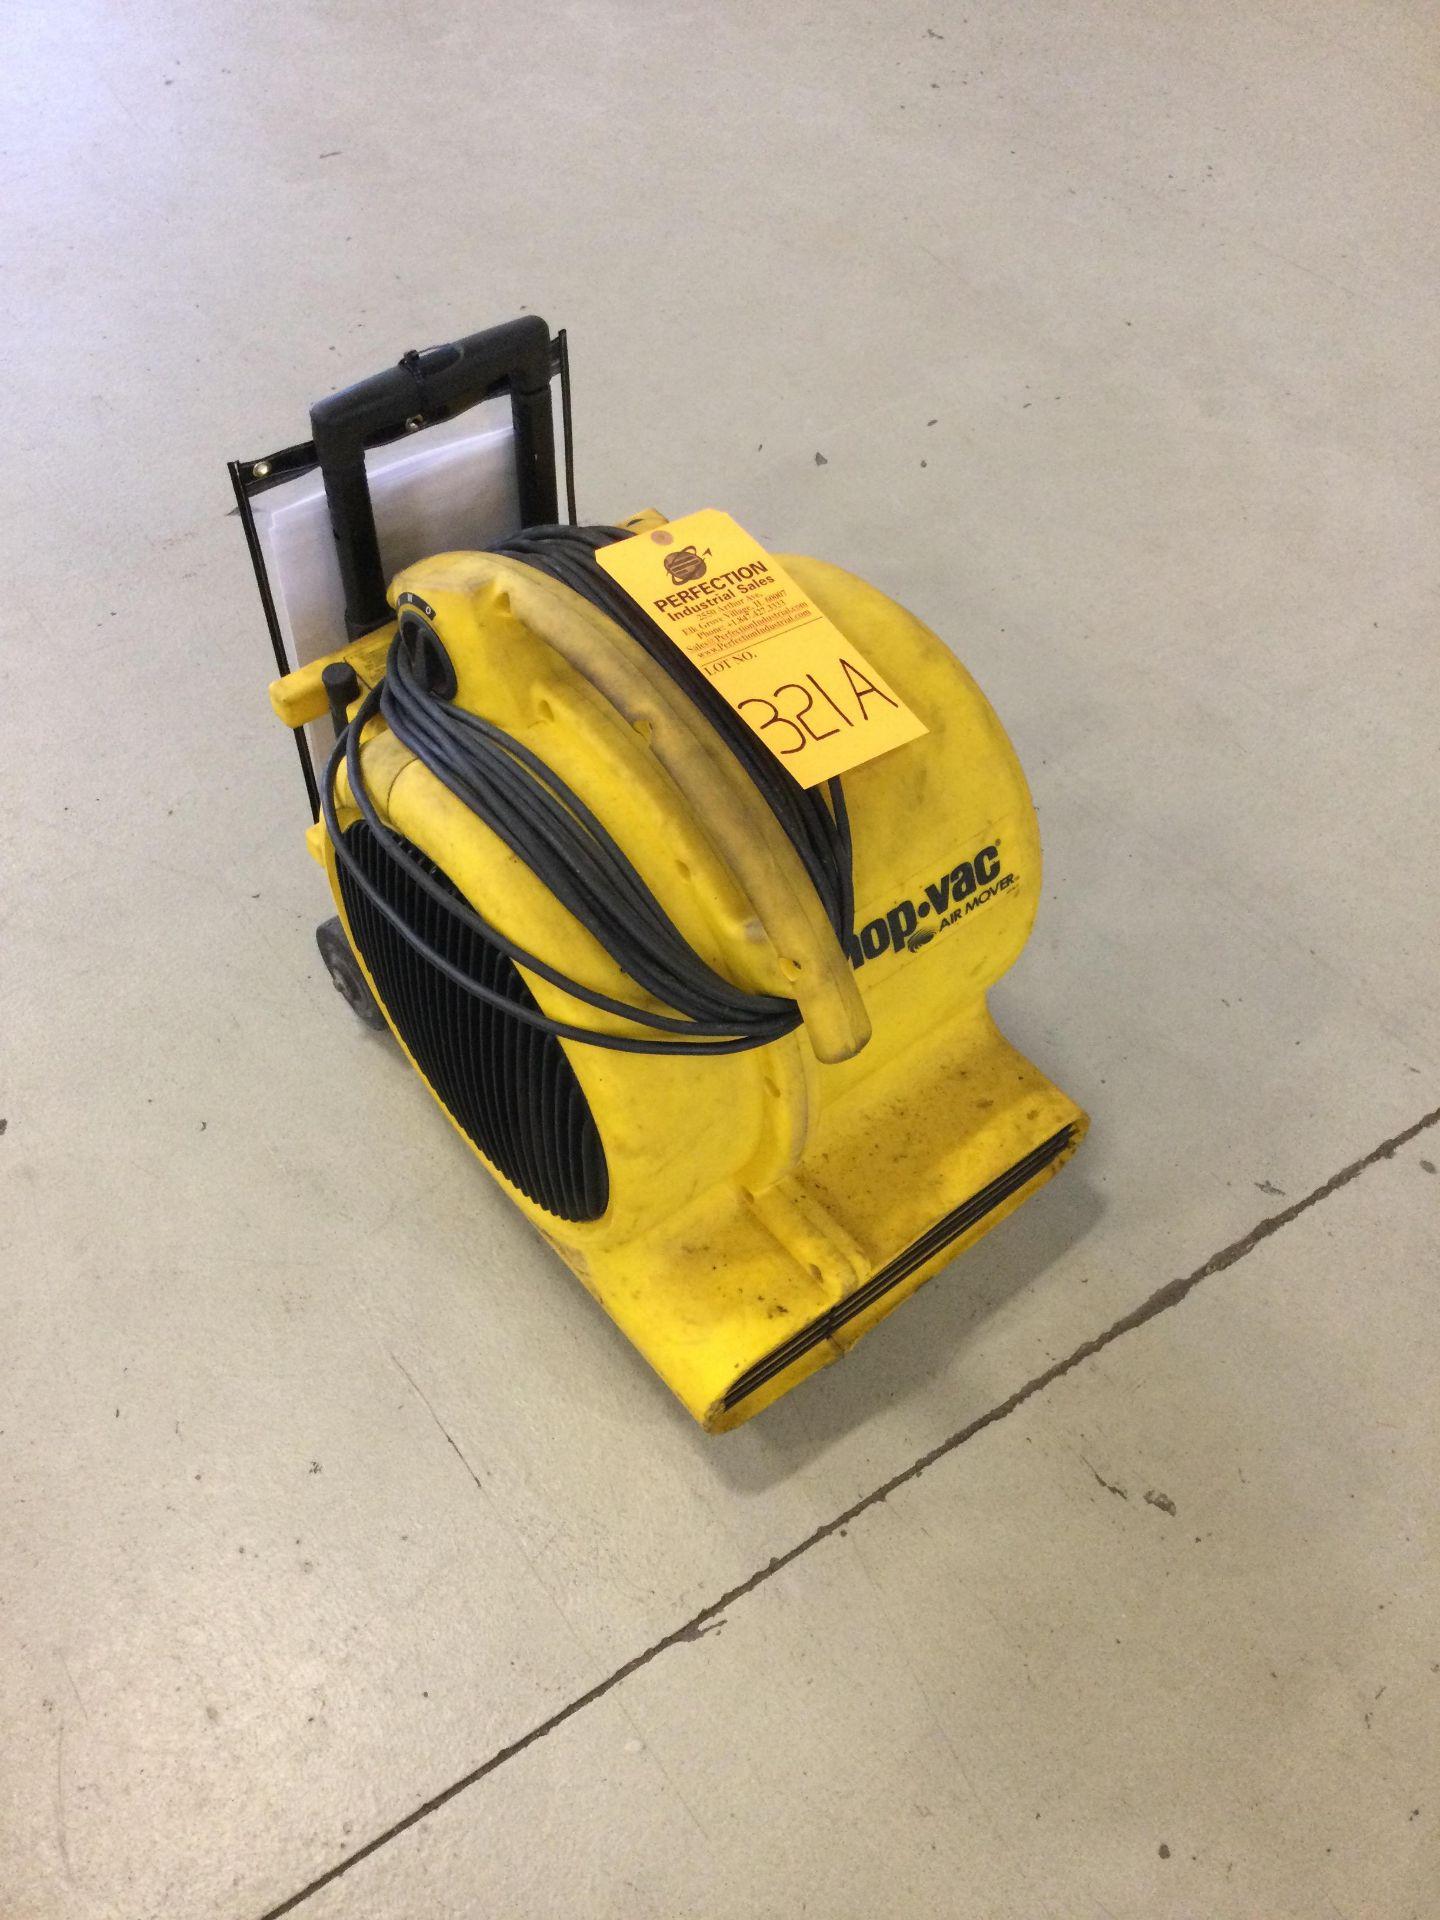 Shop-Vac Air Mover